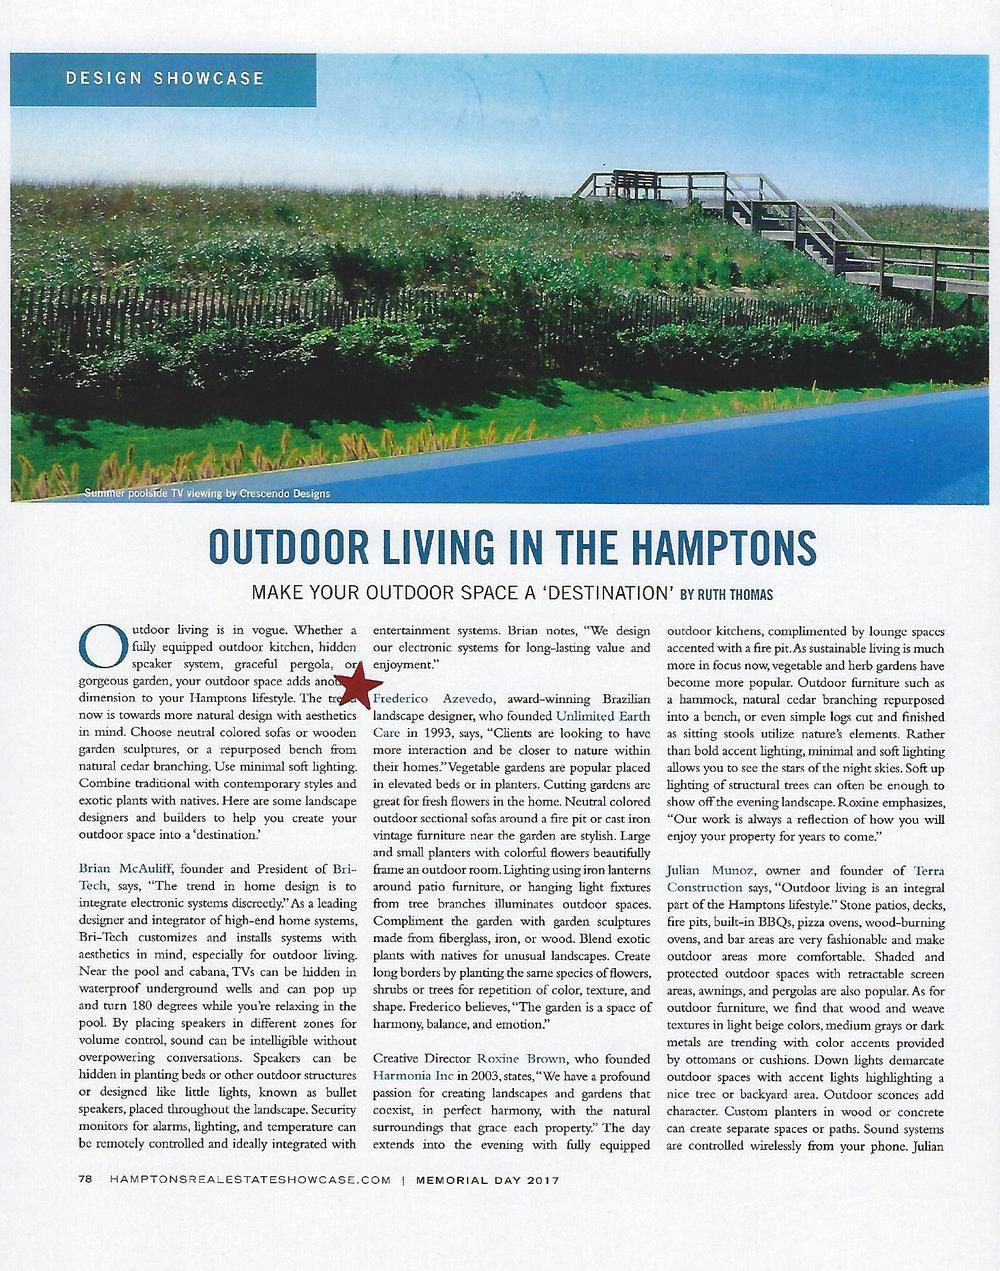 Hamptons Real Estate Showcase - Outdoor Living in the Hamptons_May 2017.jpg